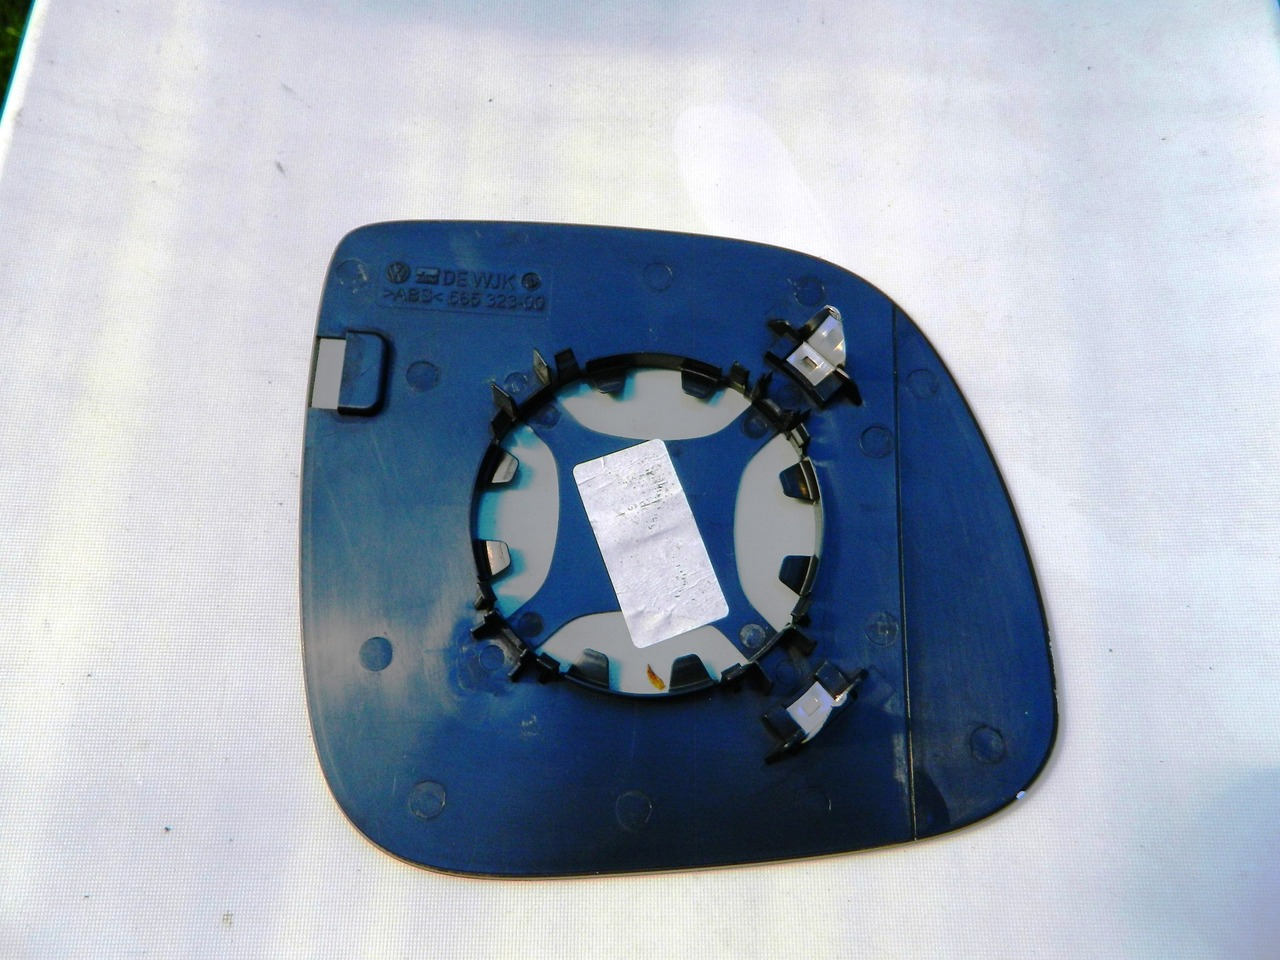 Geam oglinda stanga VW Transporter T5 model dupa 2009